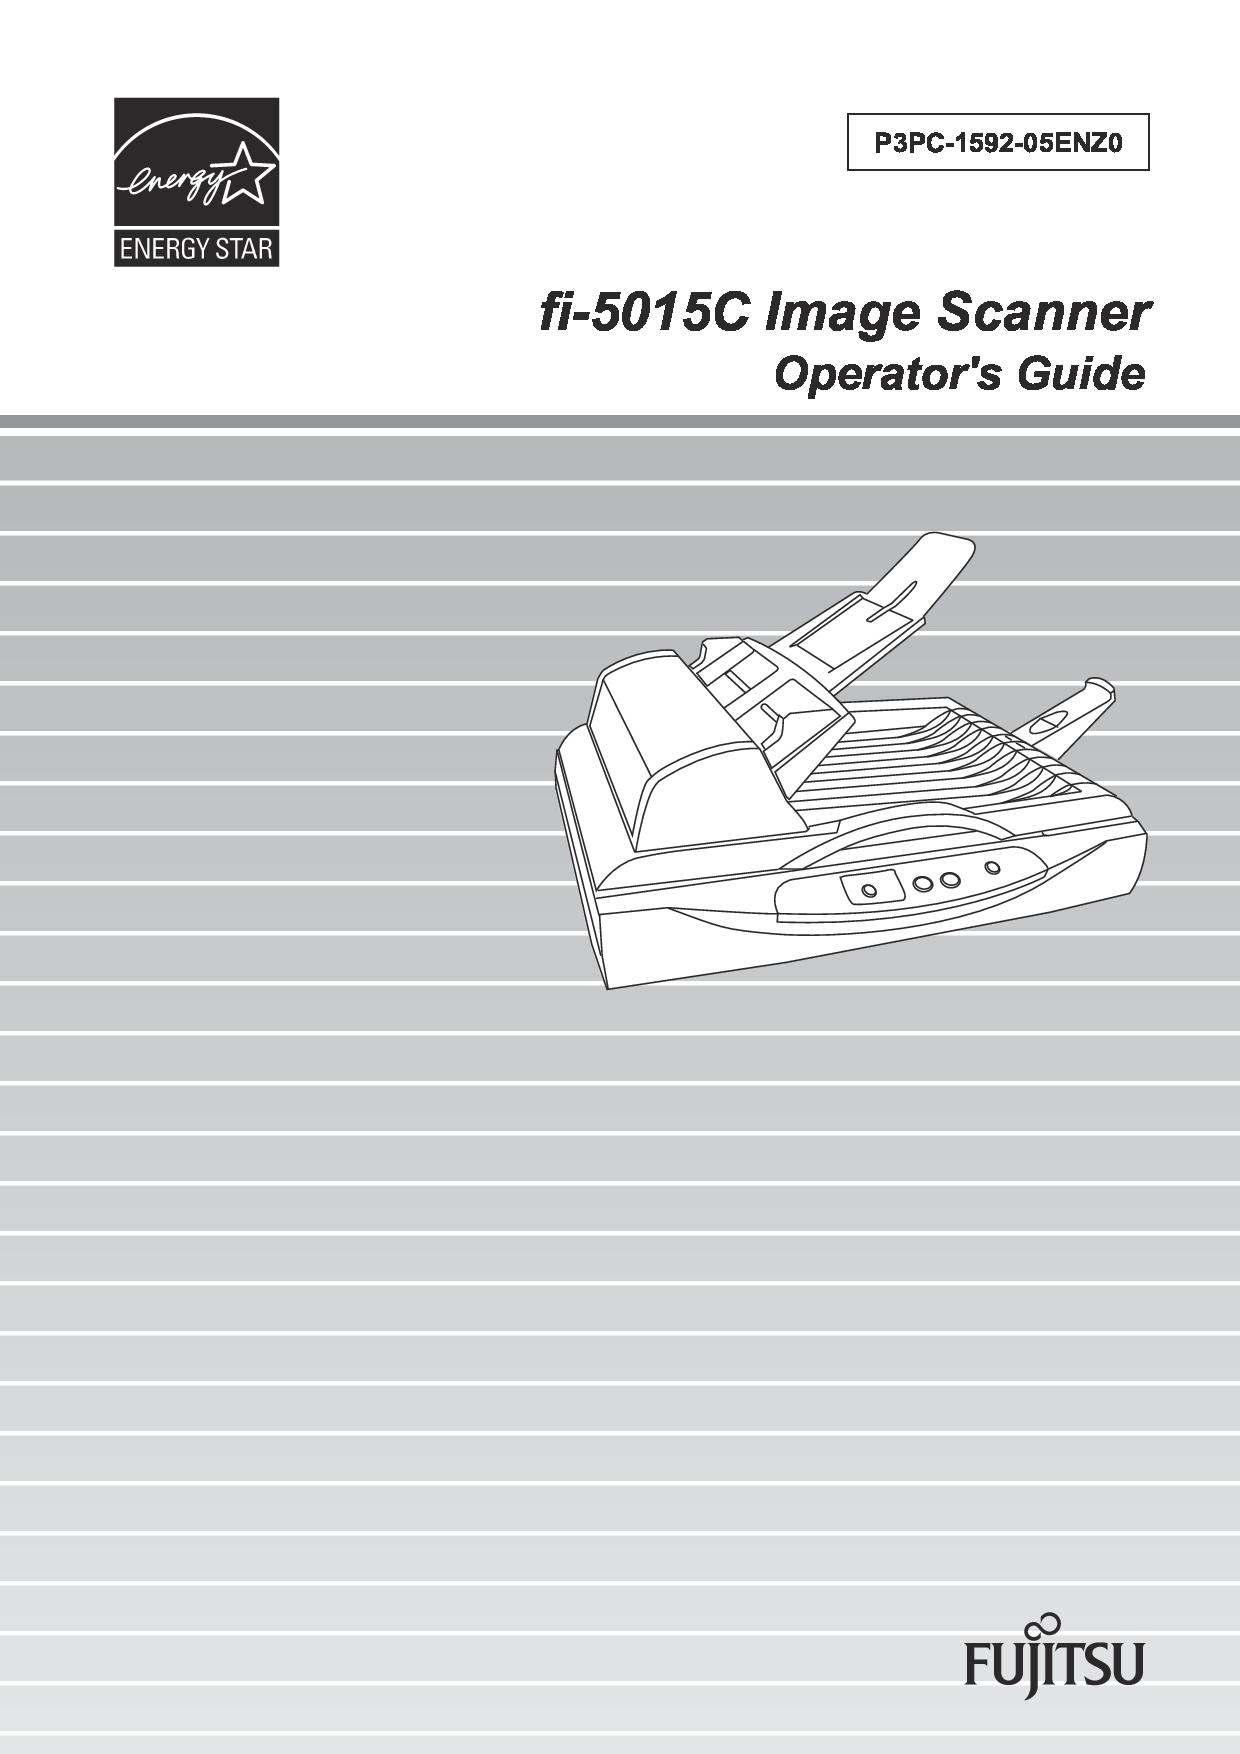 fujitsu fi-5110c scanner manual